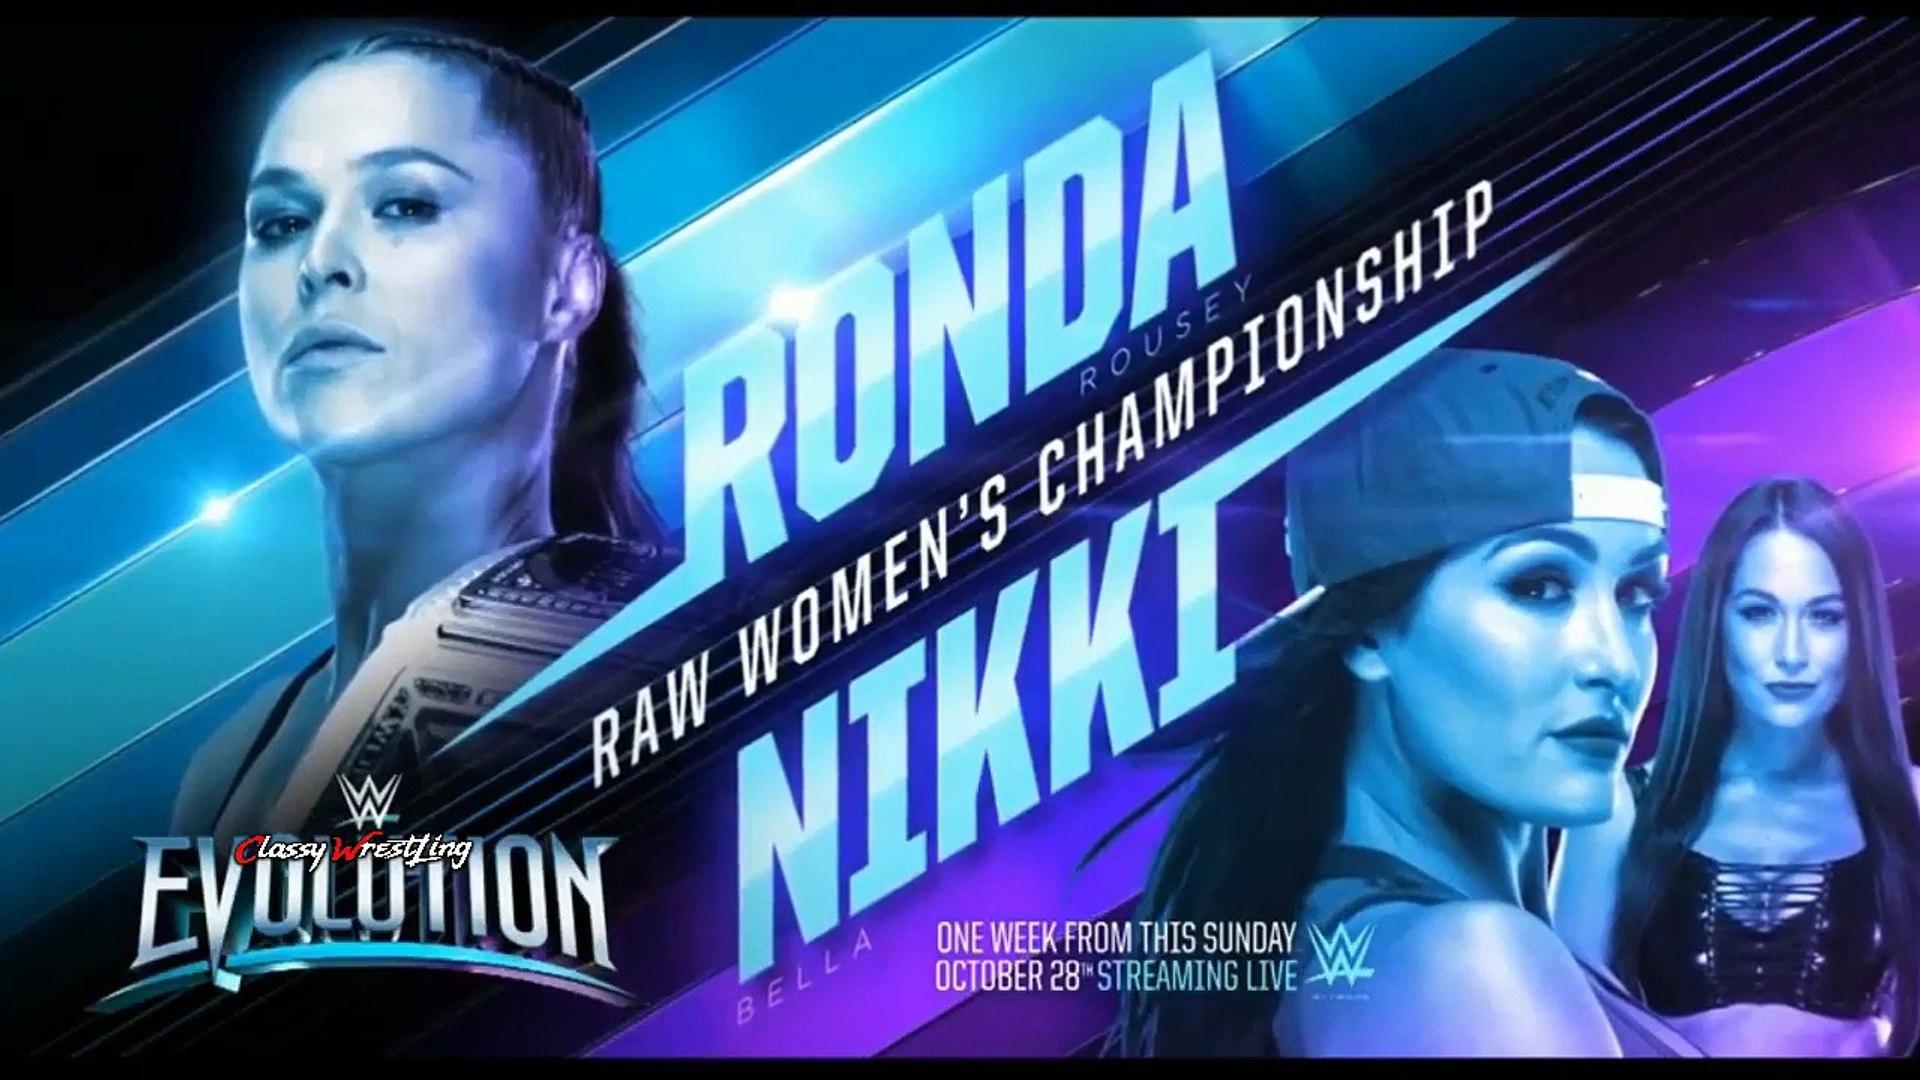 WWE RAW Highlights 15th October 2018 HD : WWE Monday Night Raw 10/15/2018 Highlights HD